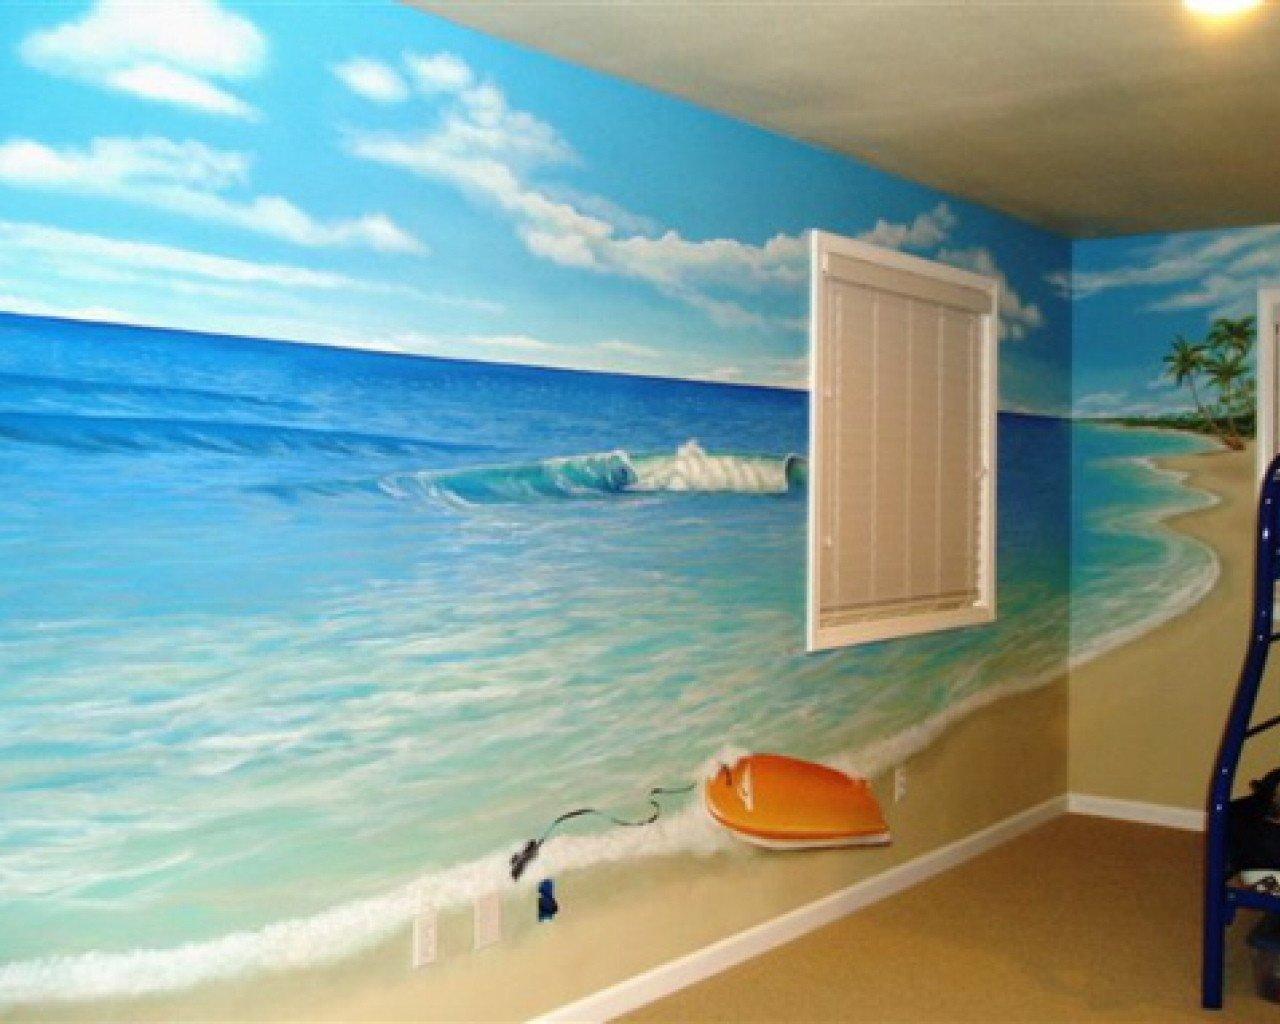 Beach themed Wall Decor Ideas Fresh 21 Great Mosaic Tile Murals Bathroom Ideas and Pictures